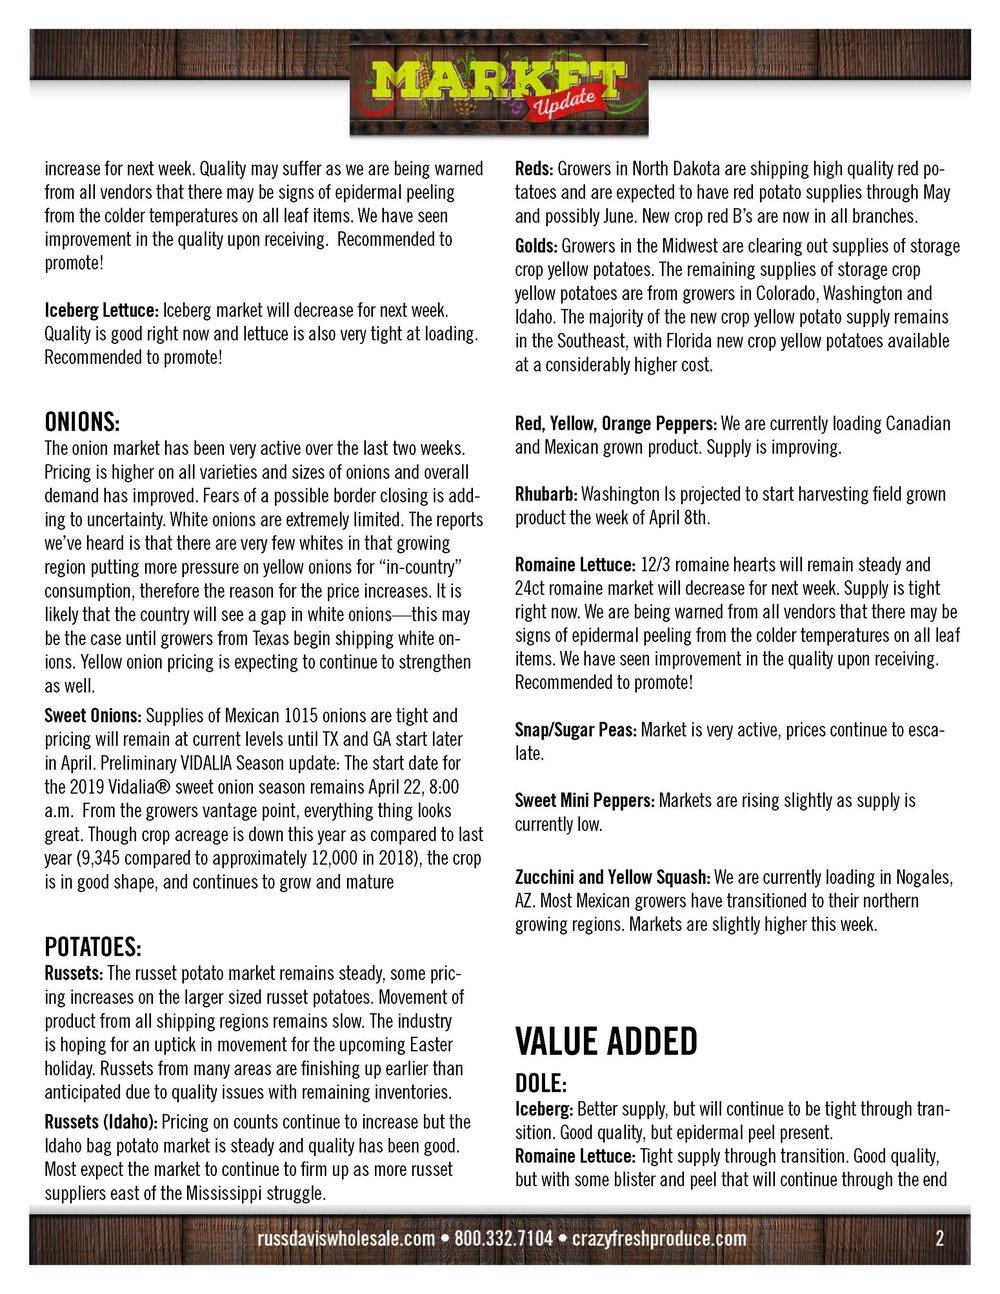 RDW_Market_Update_Apr4_19_Page_2.jpg